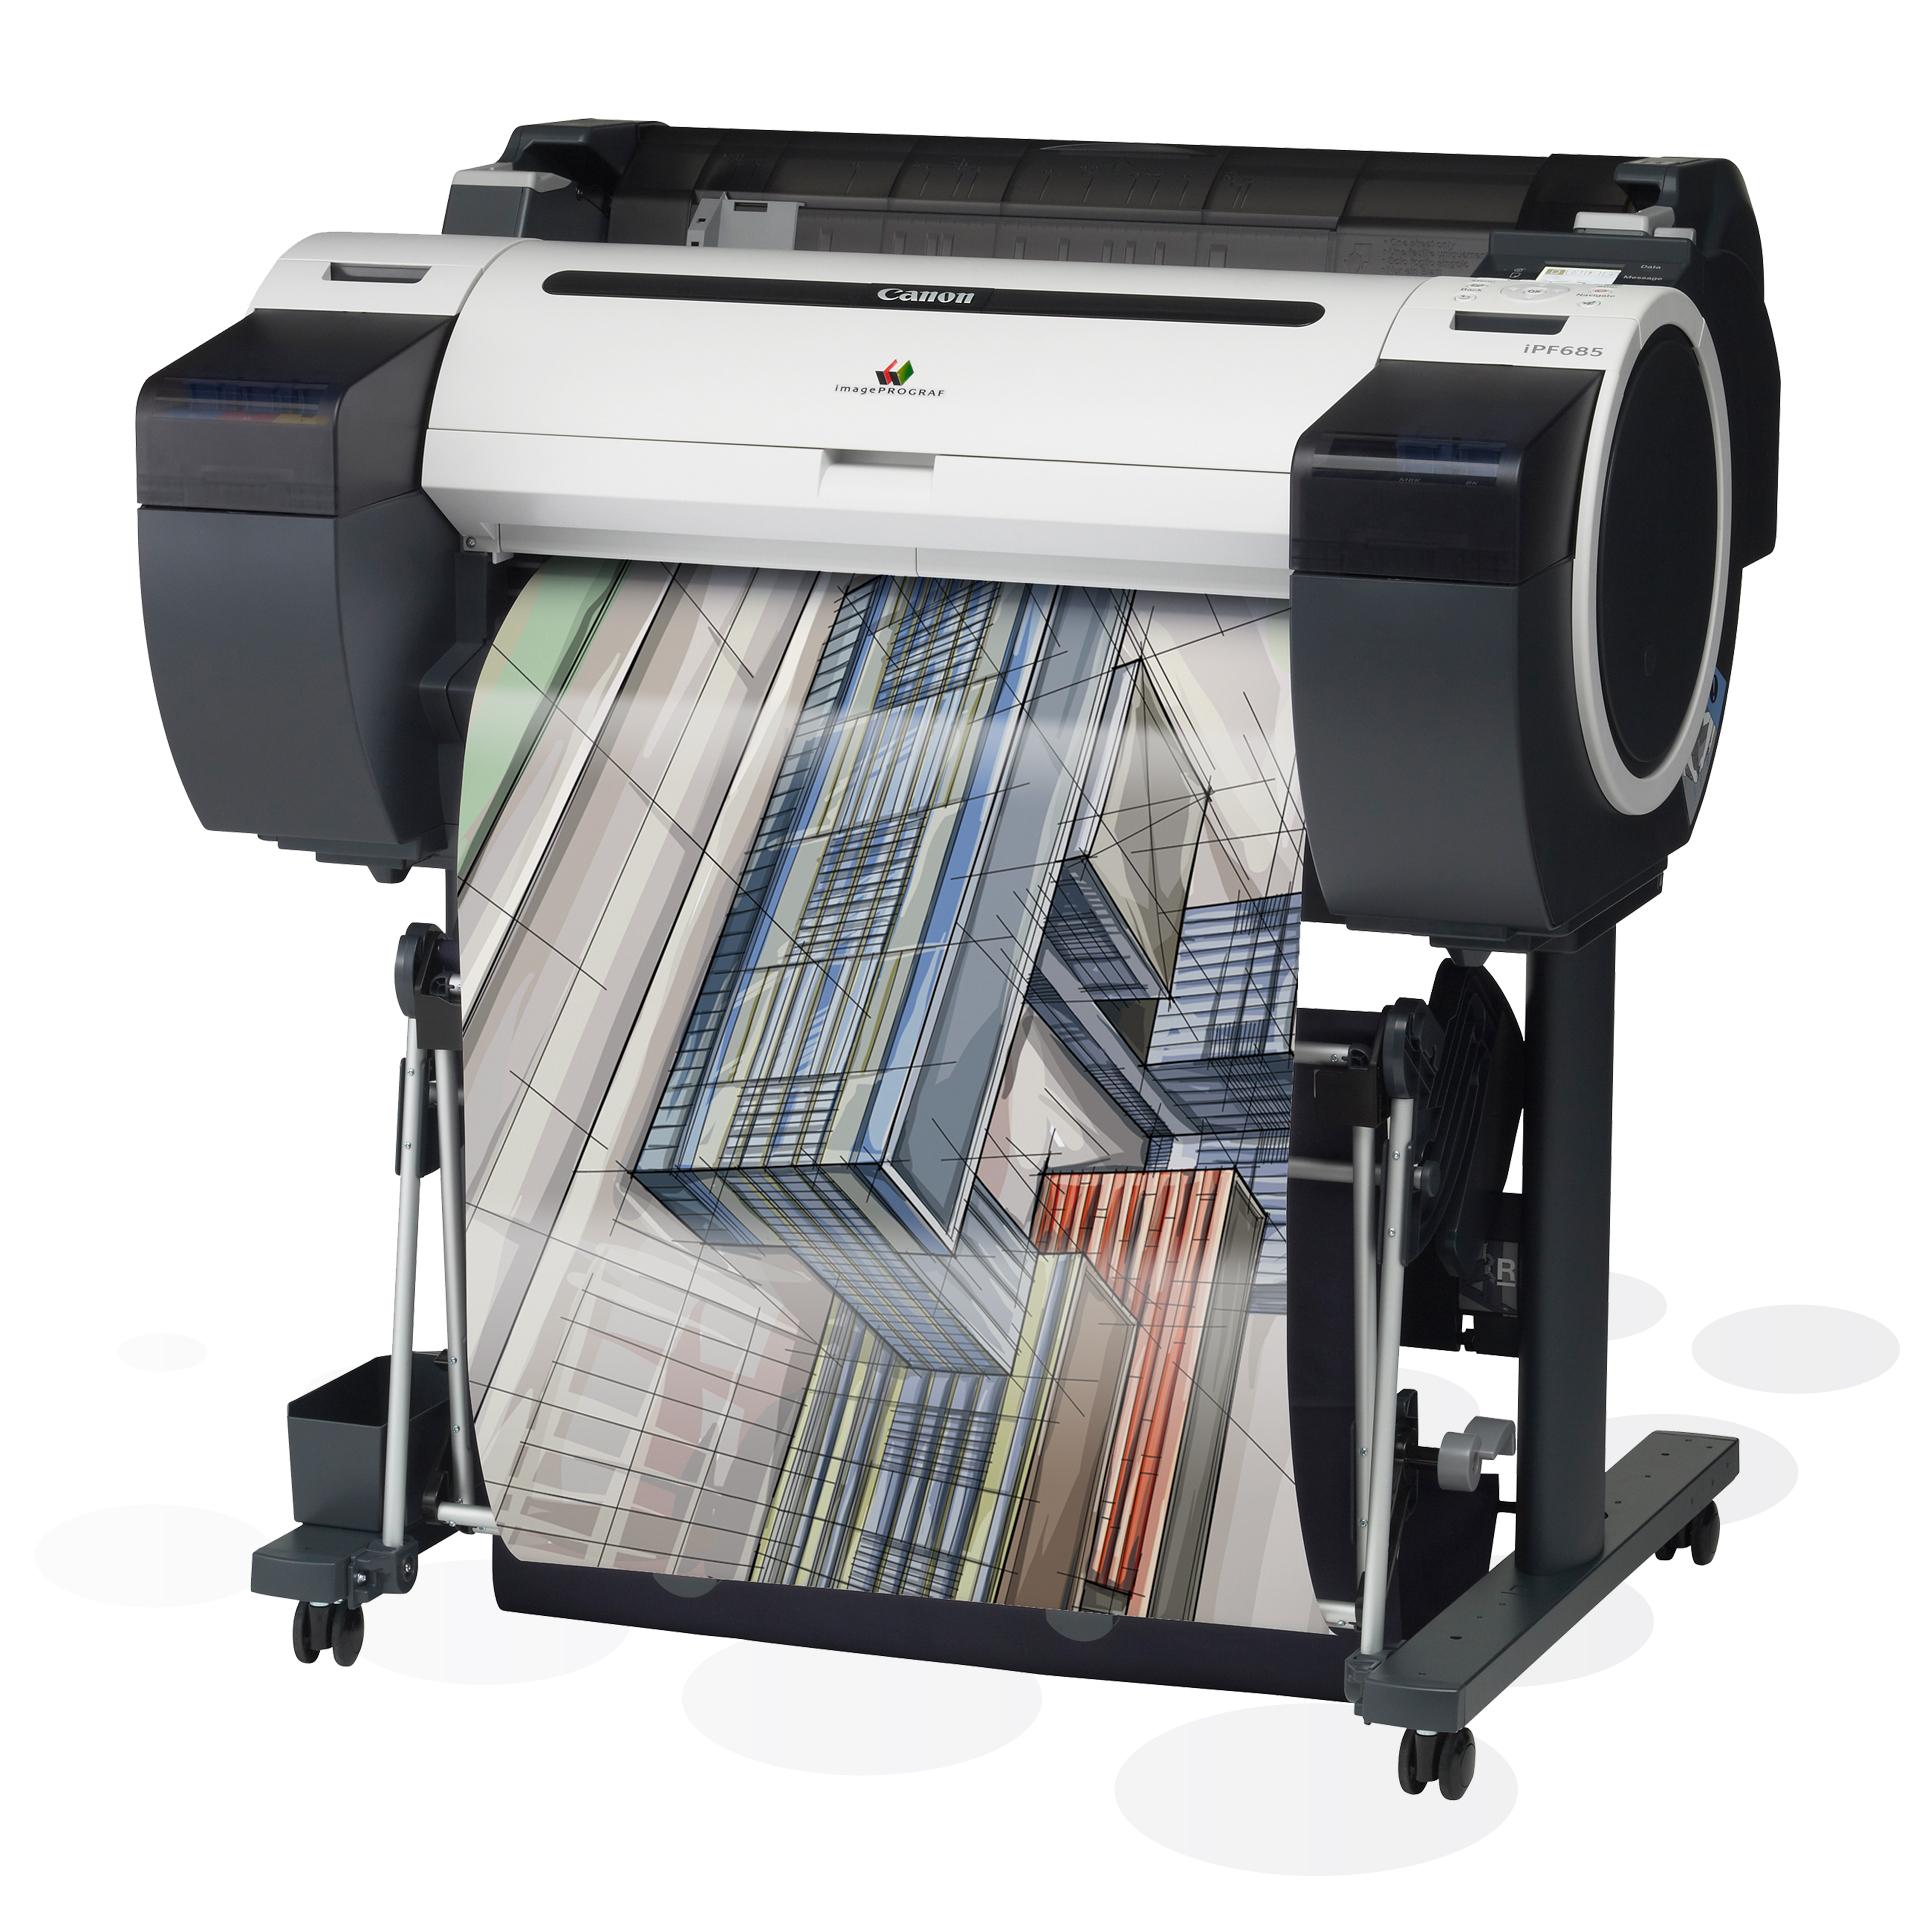 "iPF685 - 24"" Großformatdrucker"